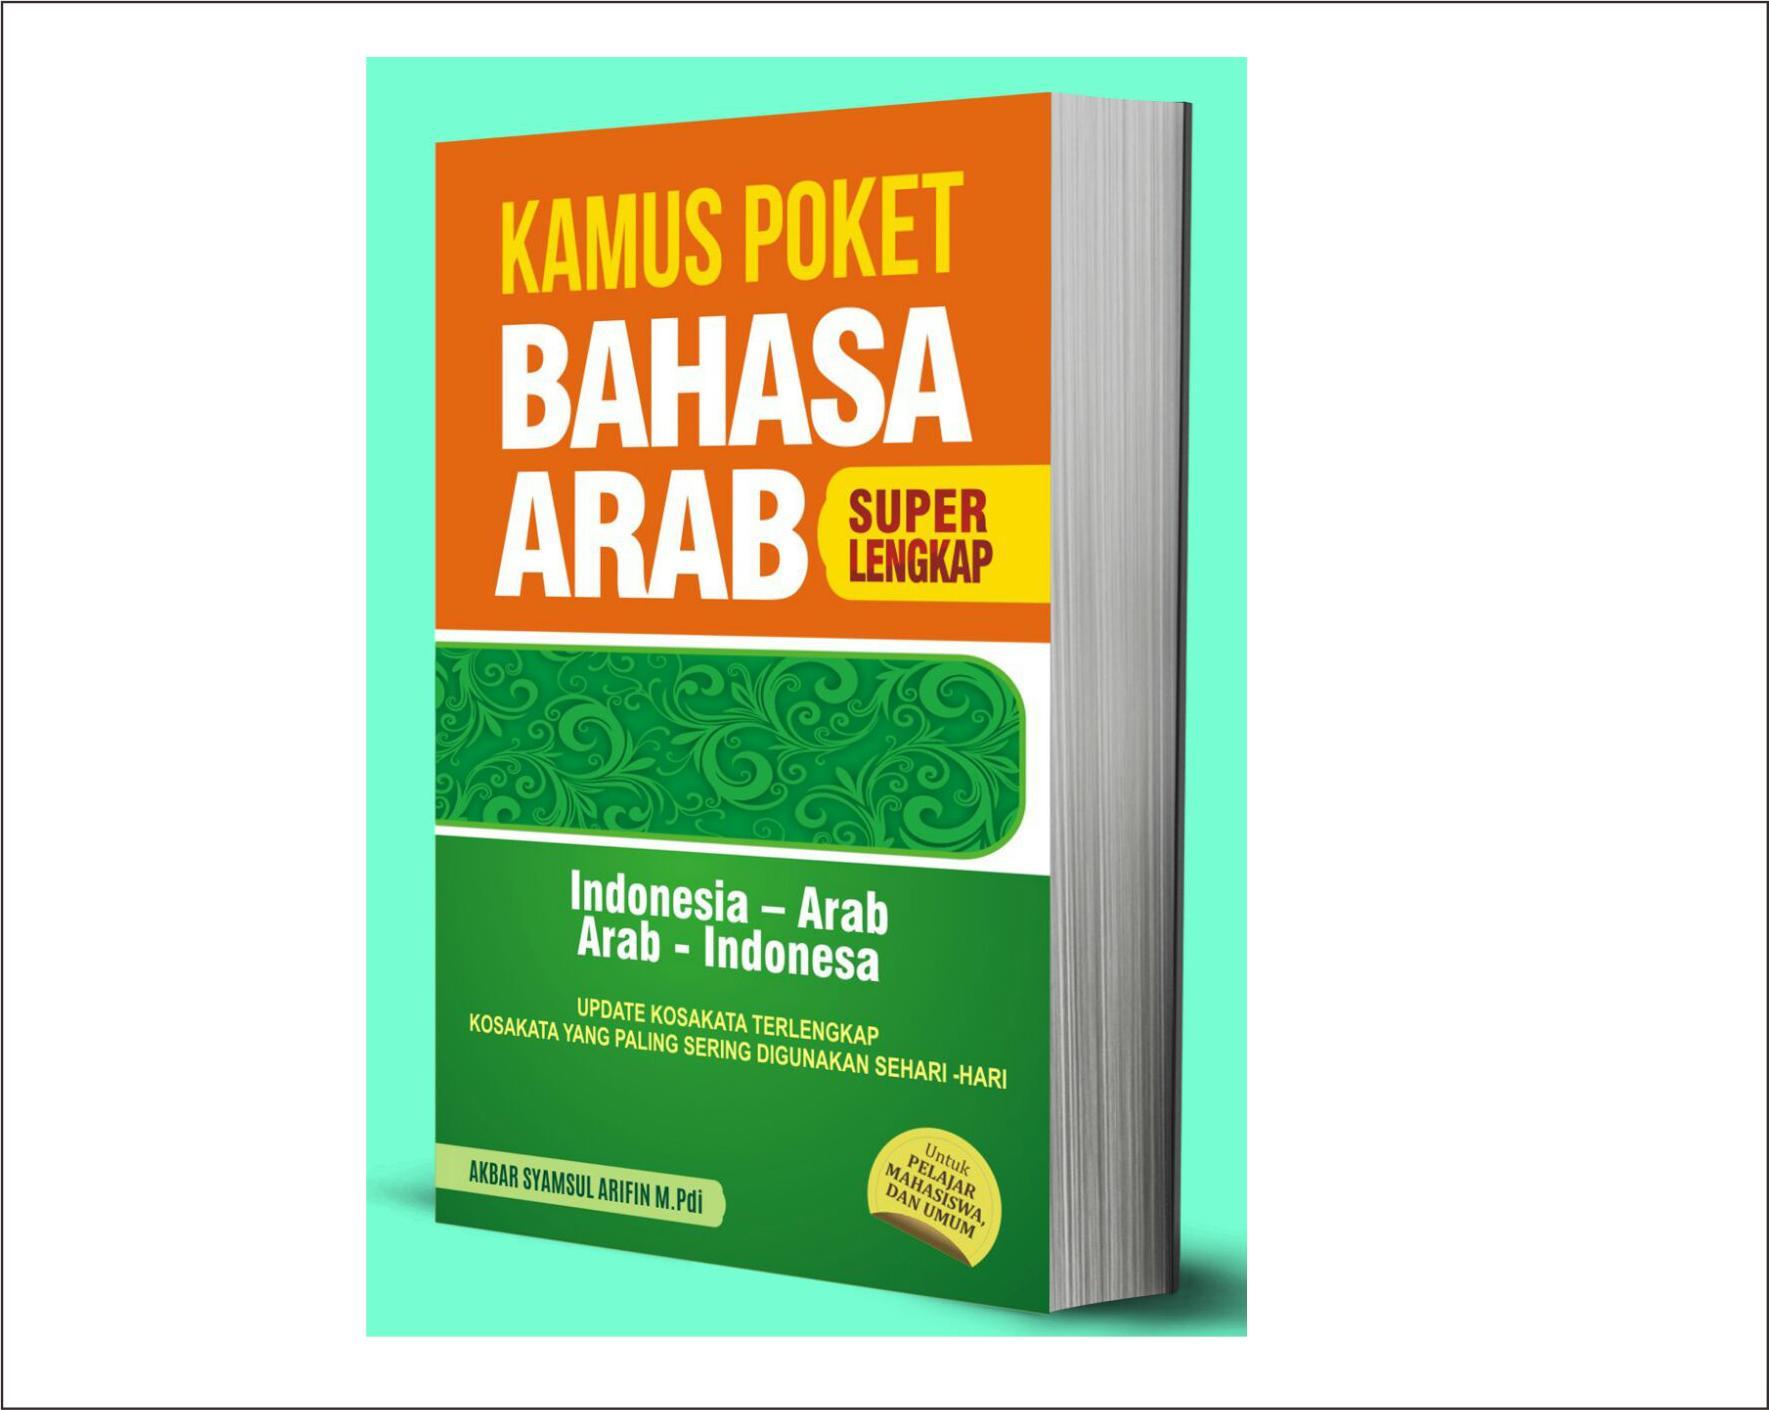 Kamus Pocket Bahasa Arab Super Lengkap - Akbar Saymsul Arifin M. Pd. I